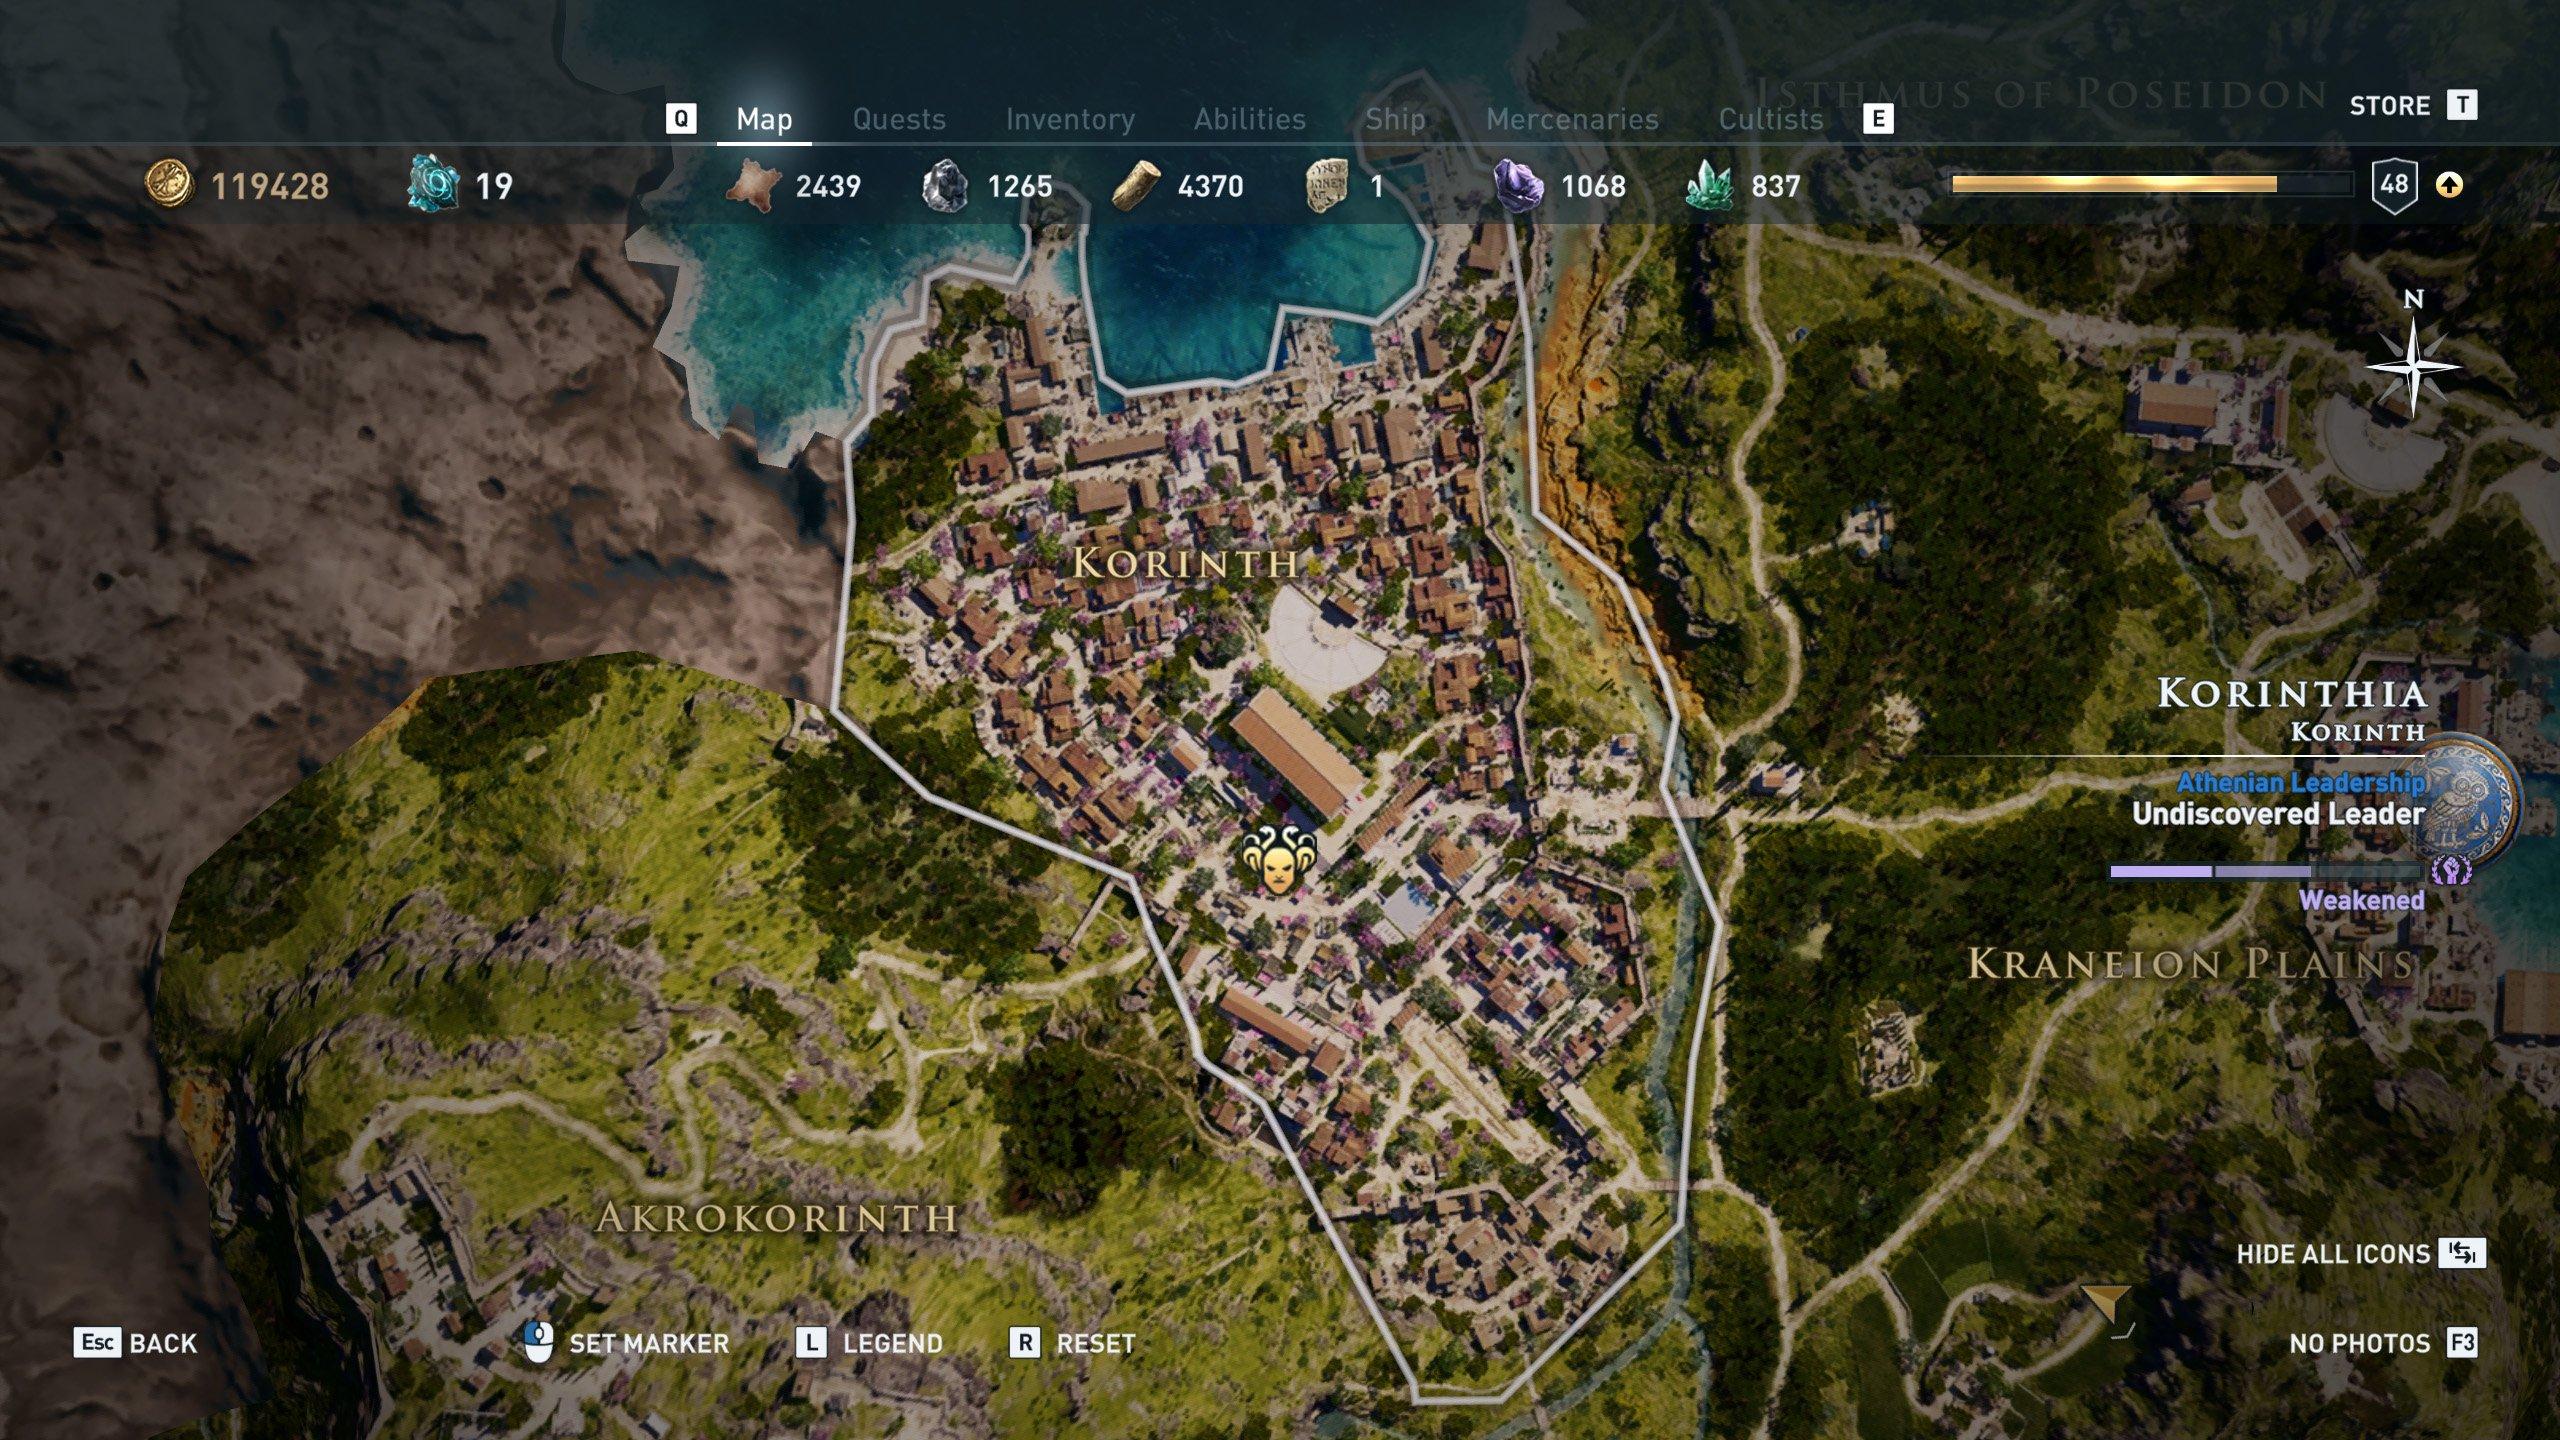 Peloponnesian League Locations Assassin S Creed Odyssey Shacknews